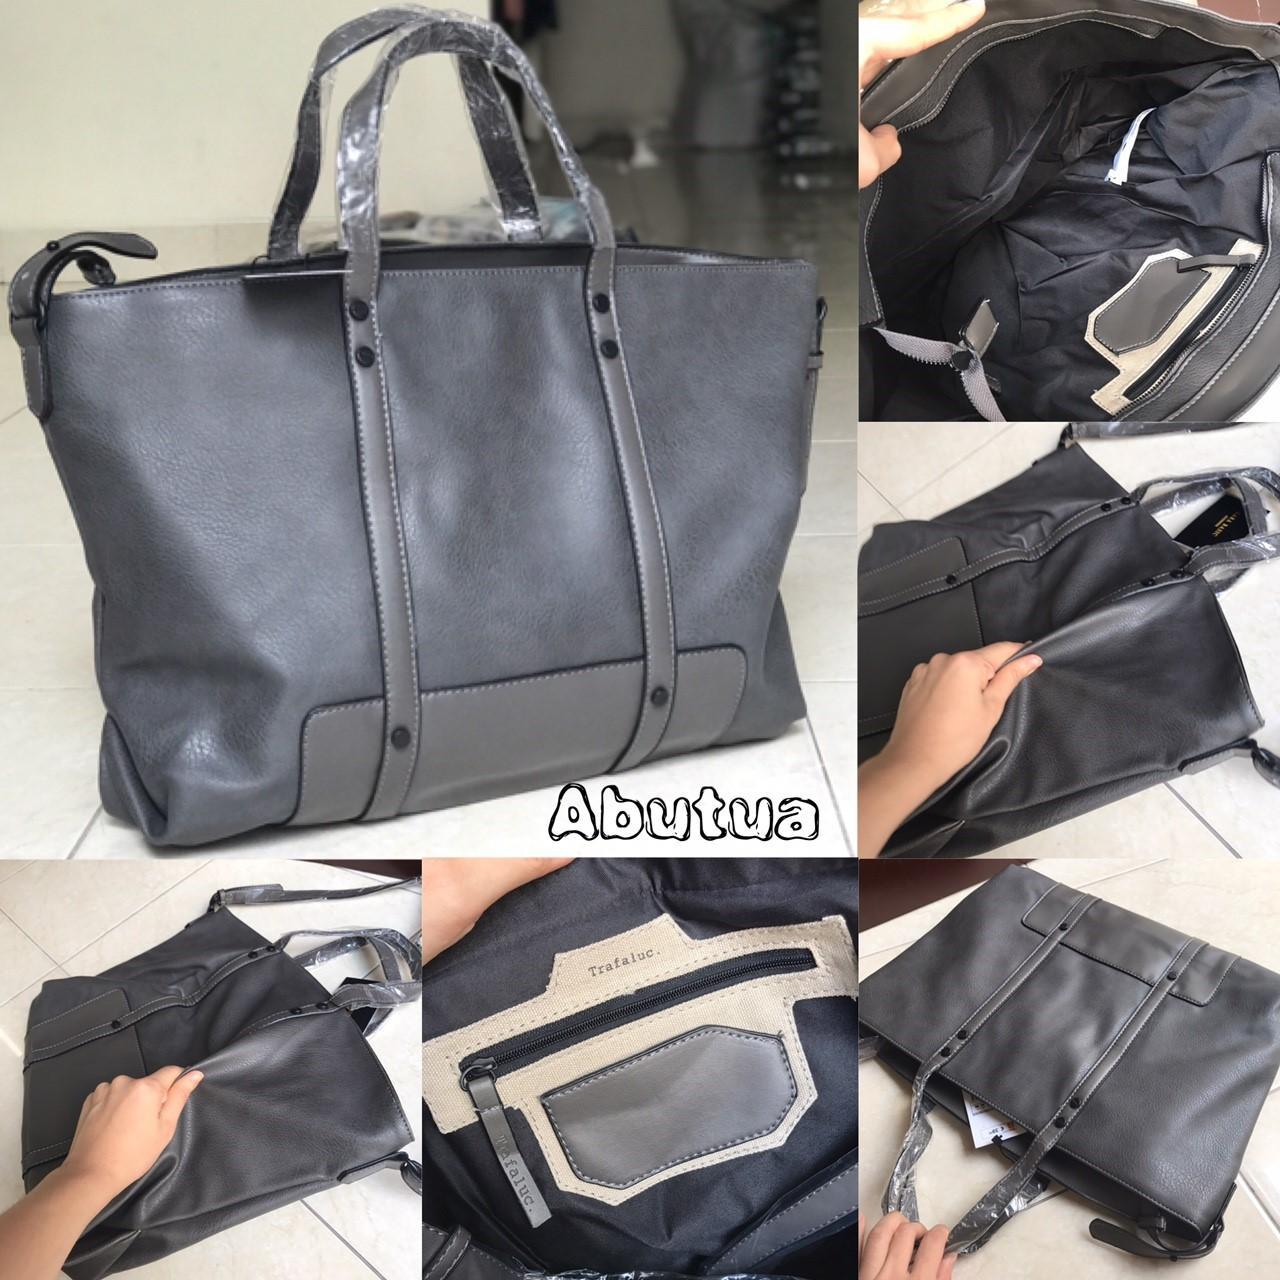 Tas wanita cewek branded handbag korea grosir cewek murah import Zar* BasicC